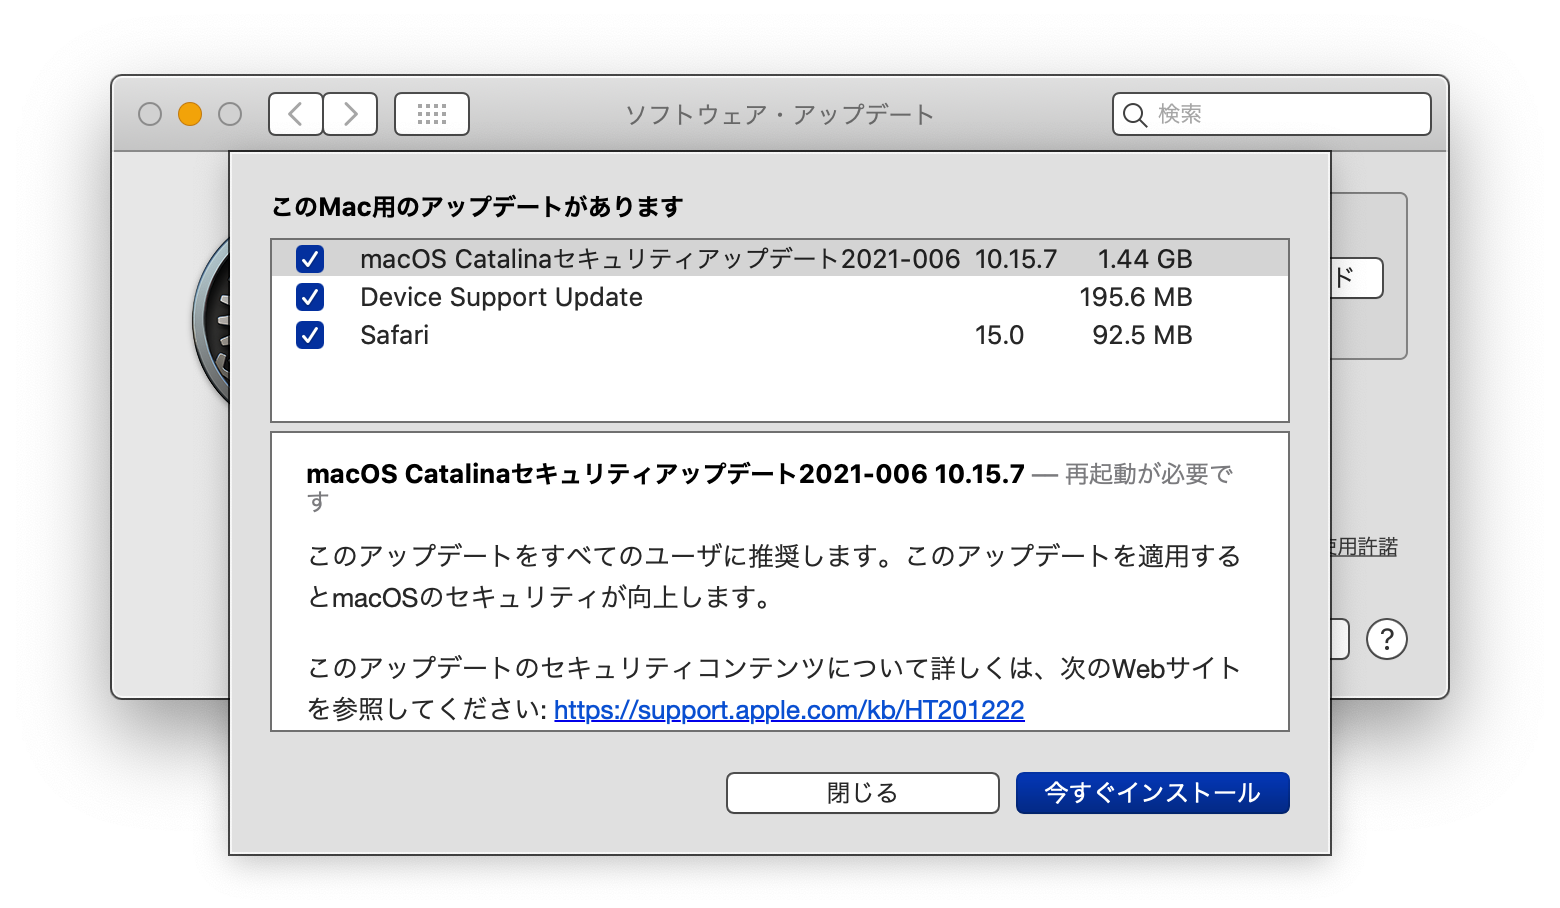 macOS Catalina セキュリティアップデート